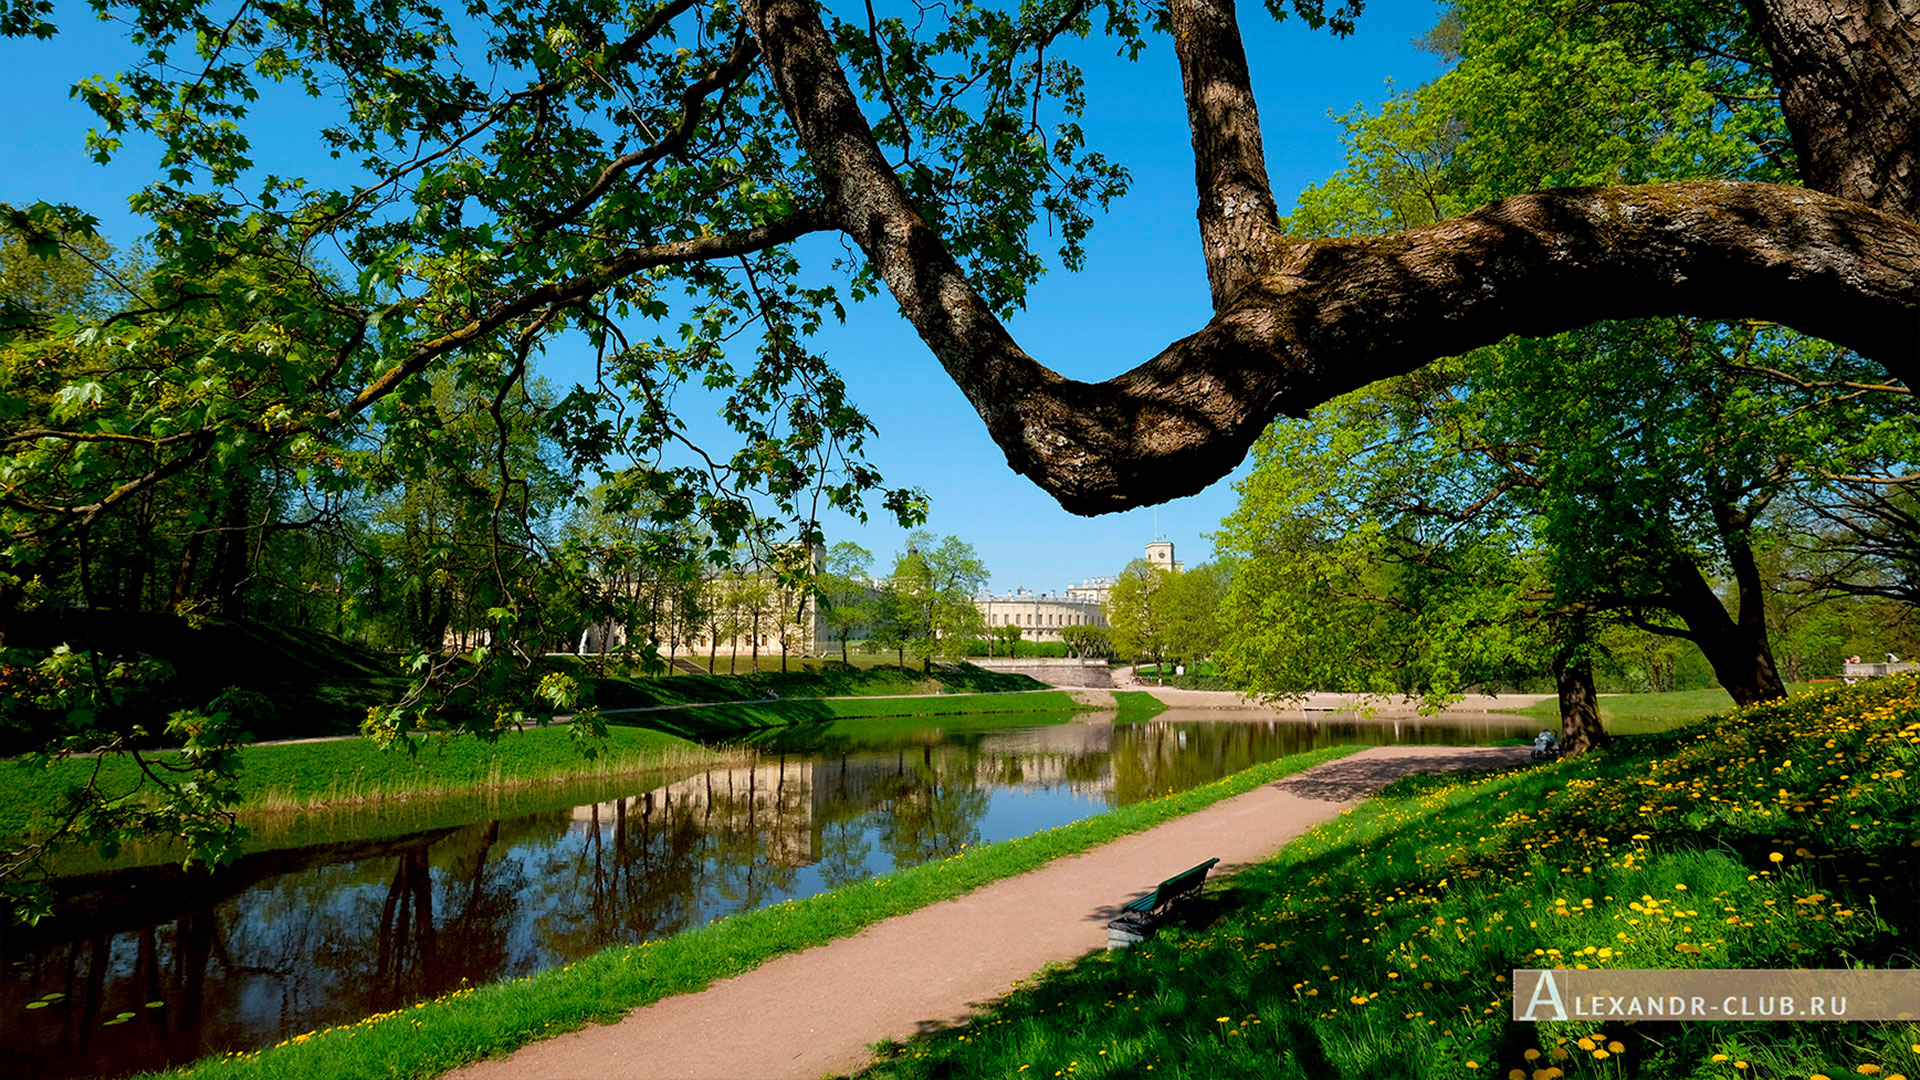 Гатчинский парк, весна, Гатчинский дворец